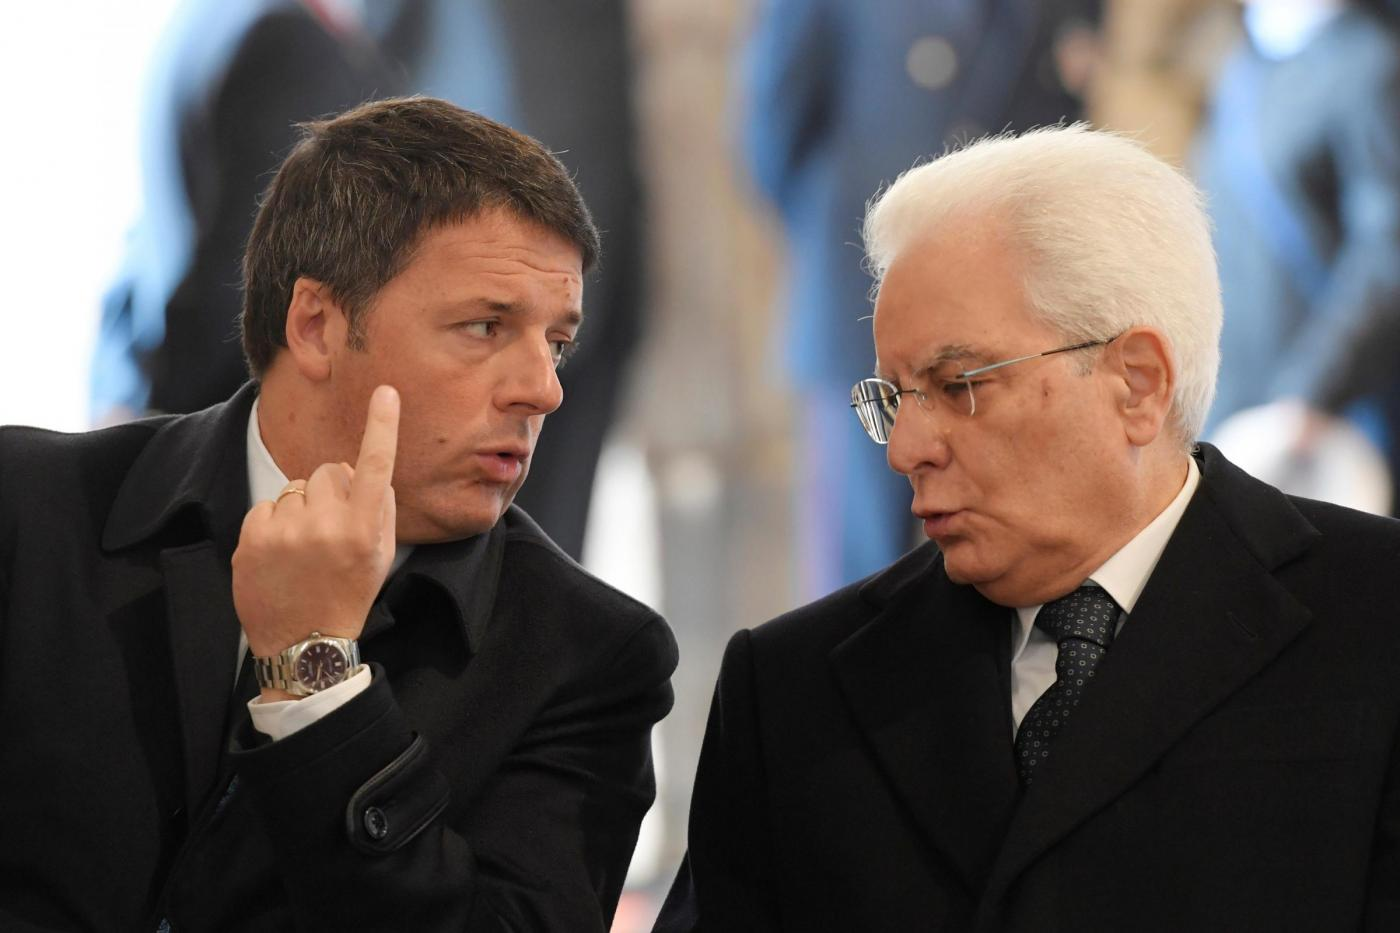 Matteo Renzi dimissioni: Mattarella può rifiutarle?